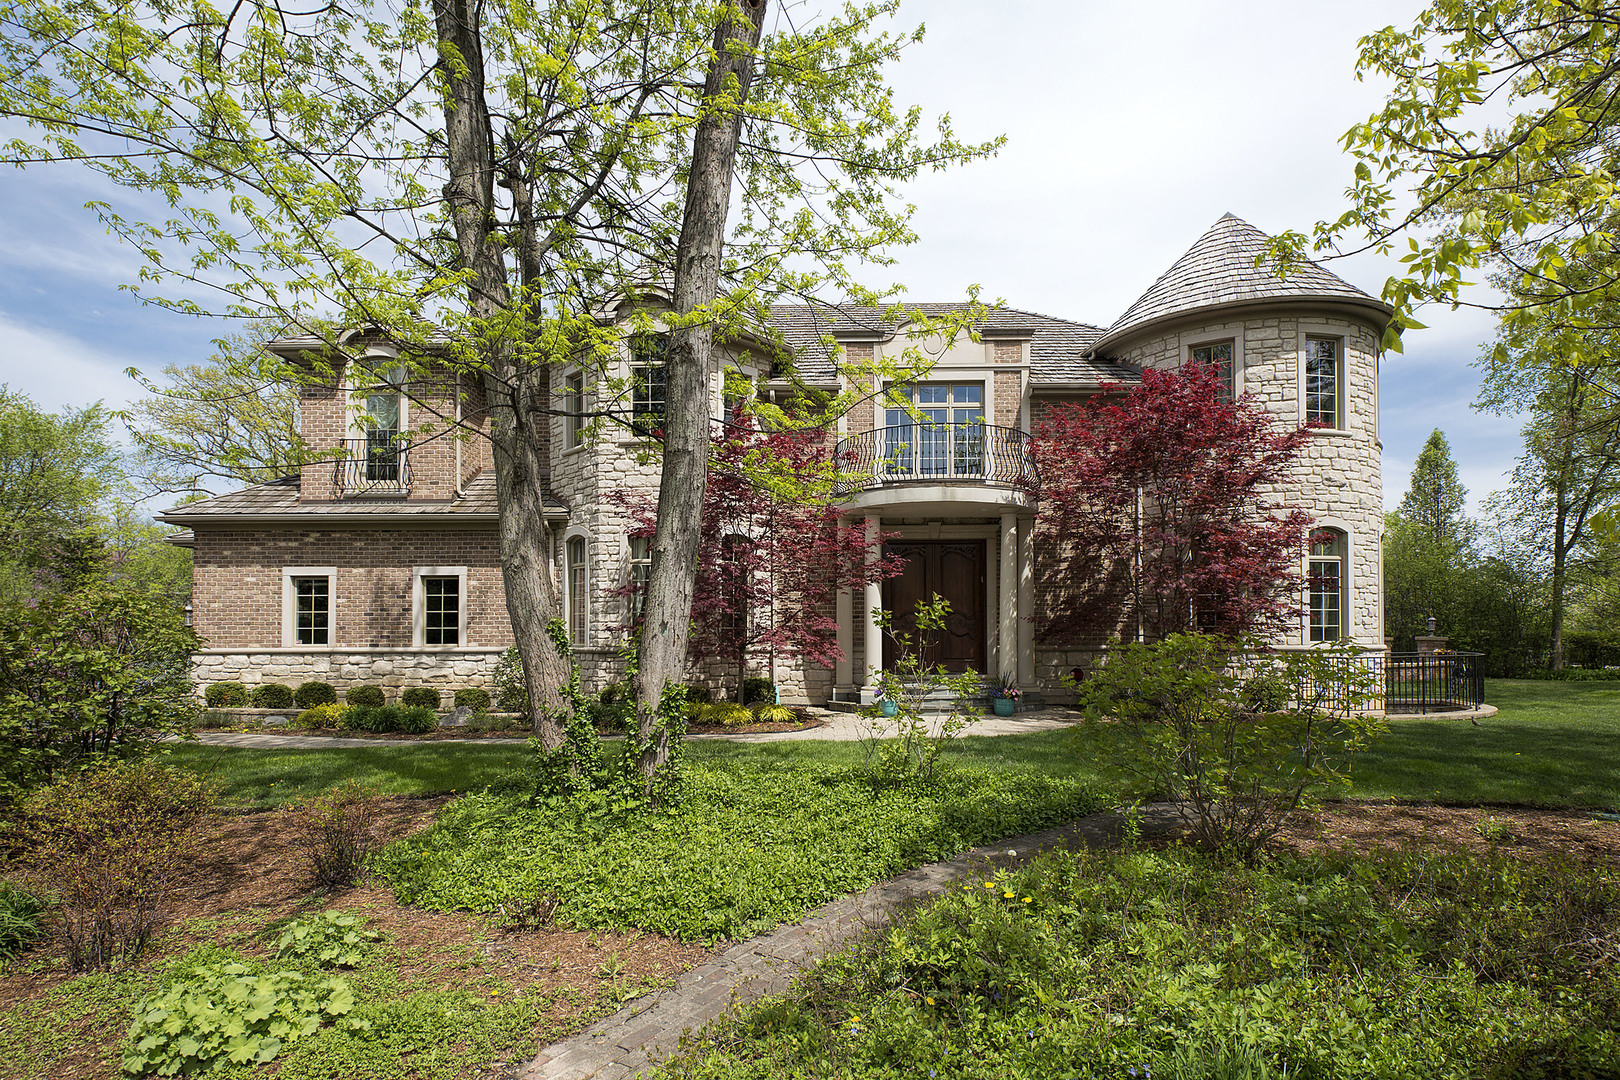 1749 East Ridgewood Lane, Glenview, IL 60025